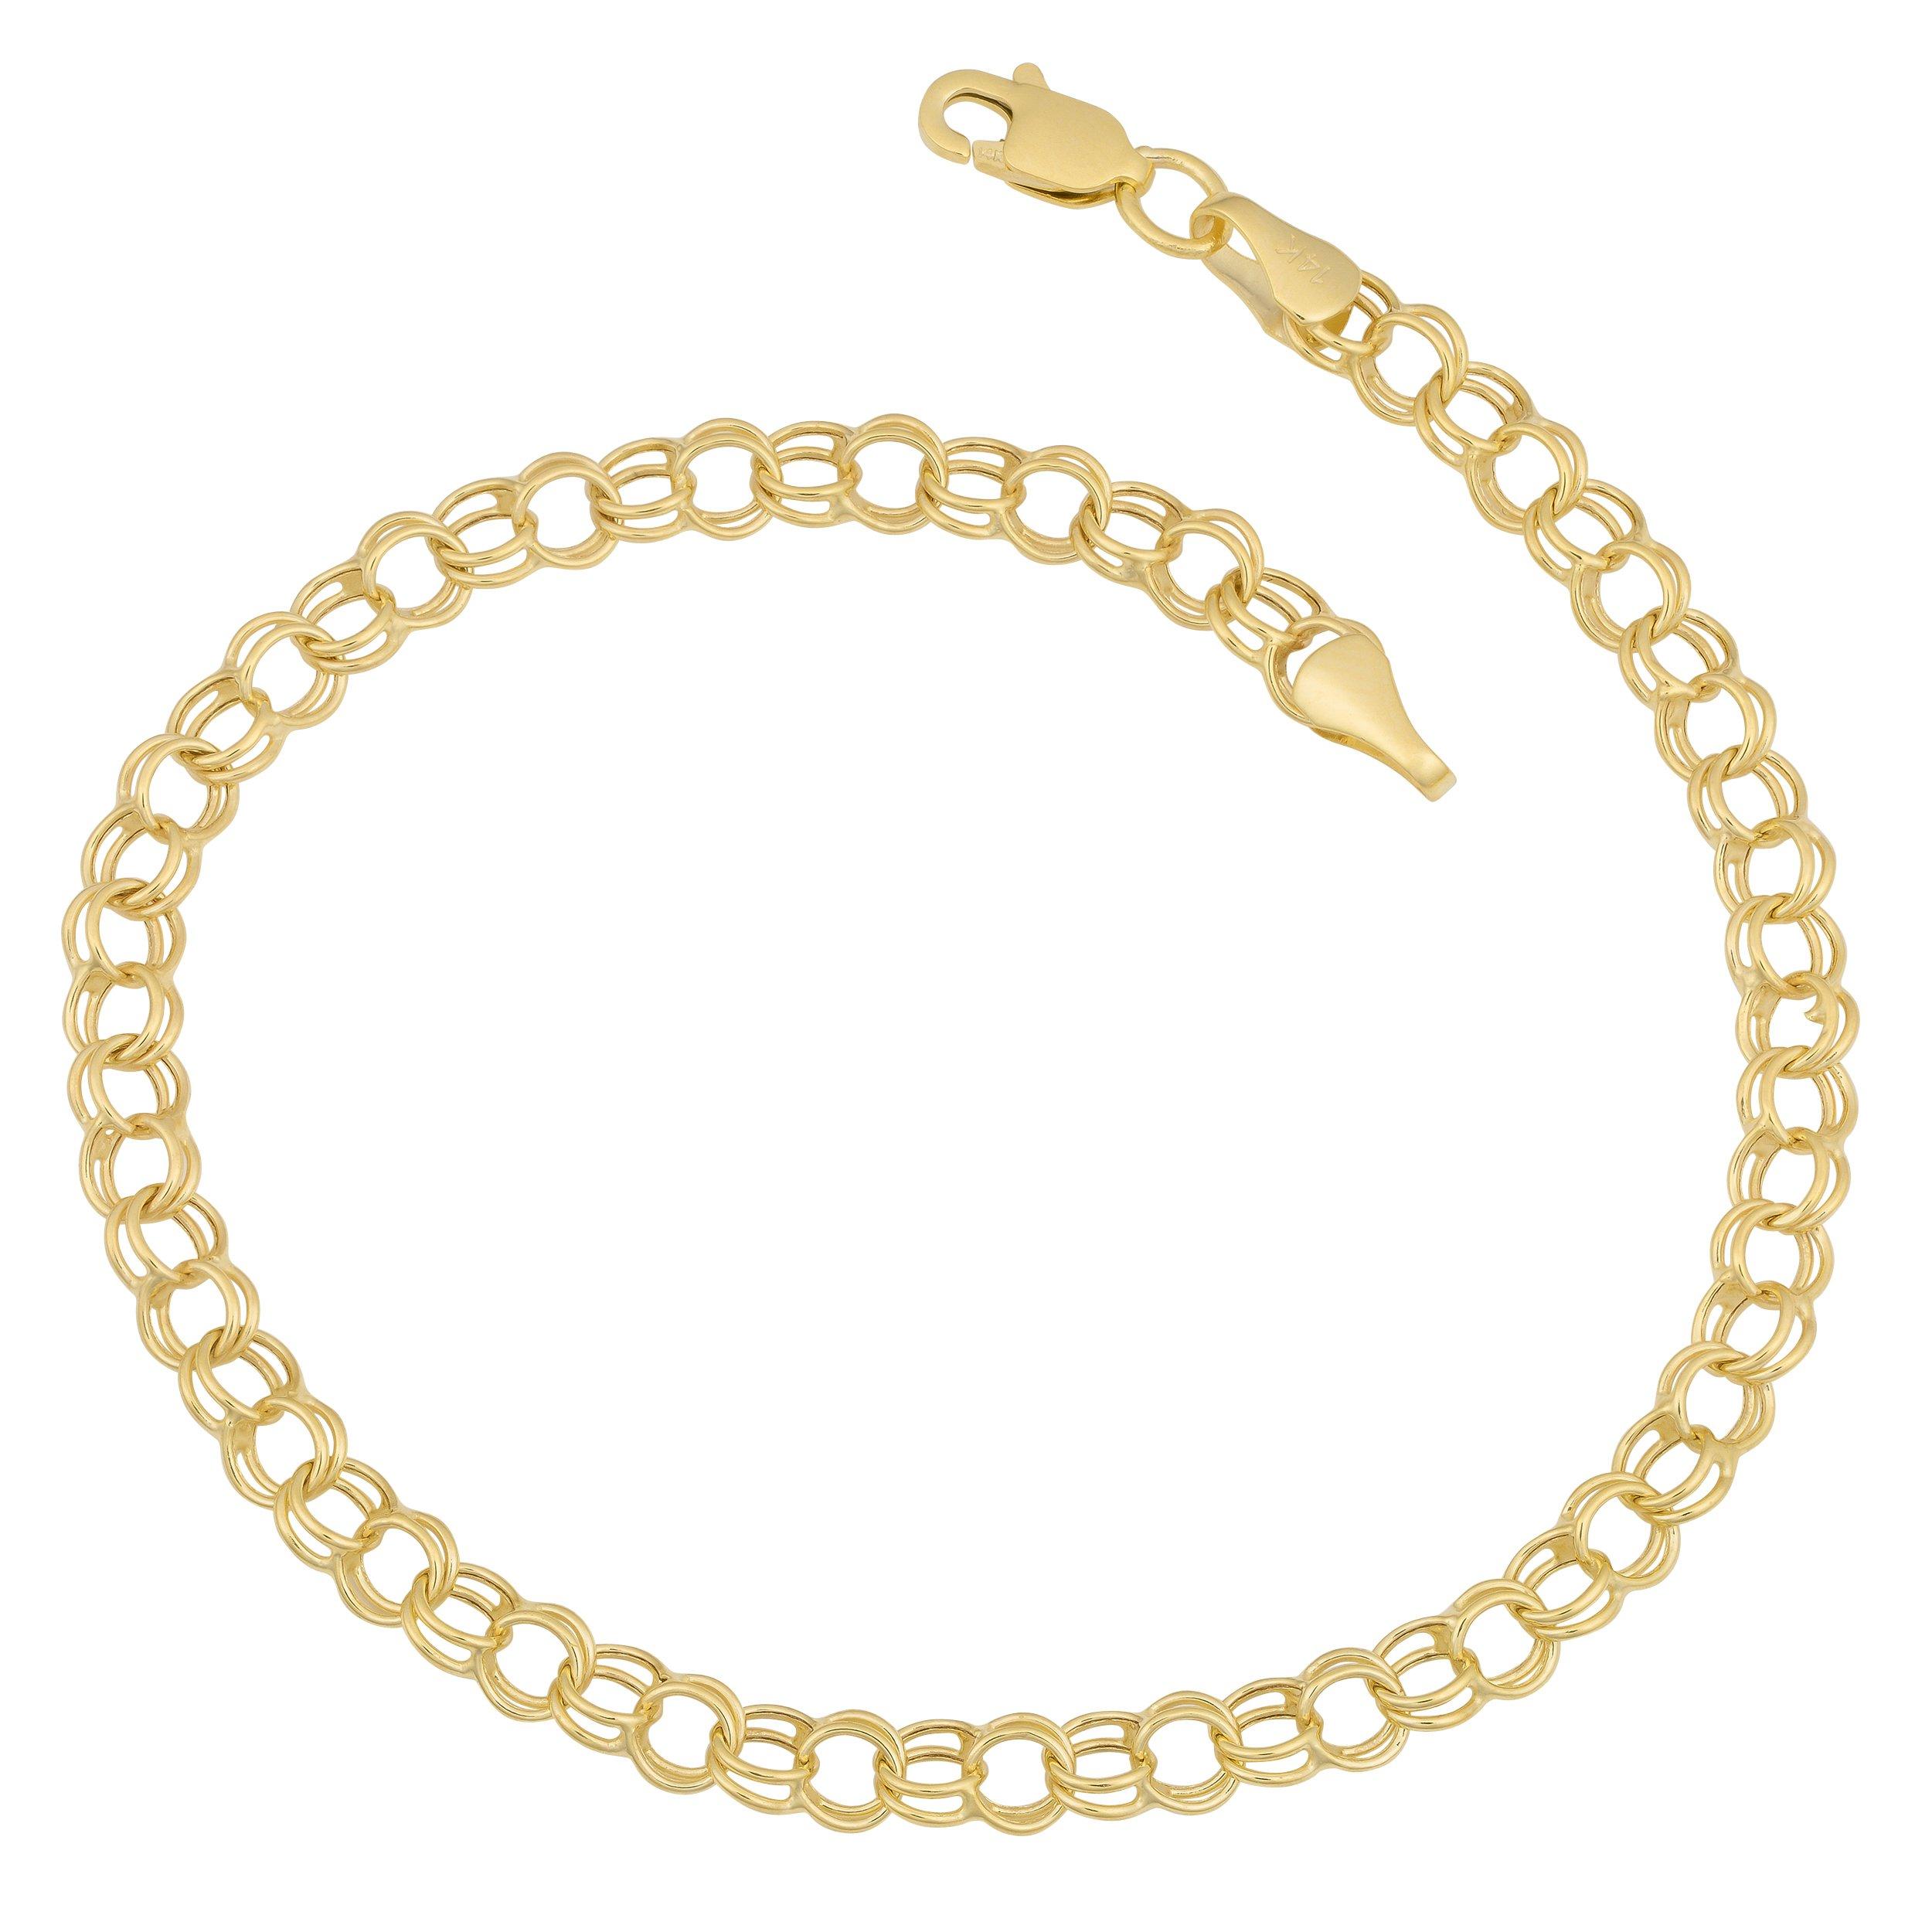 14k Yellow Gold 4mm Round Charm Link Bracelet (7.5 inch)